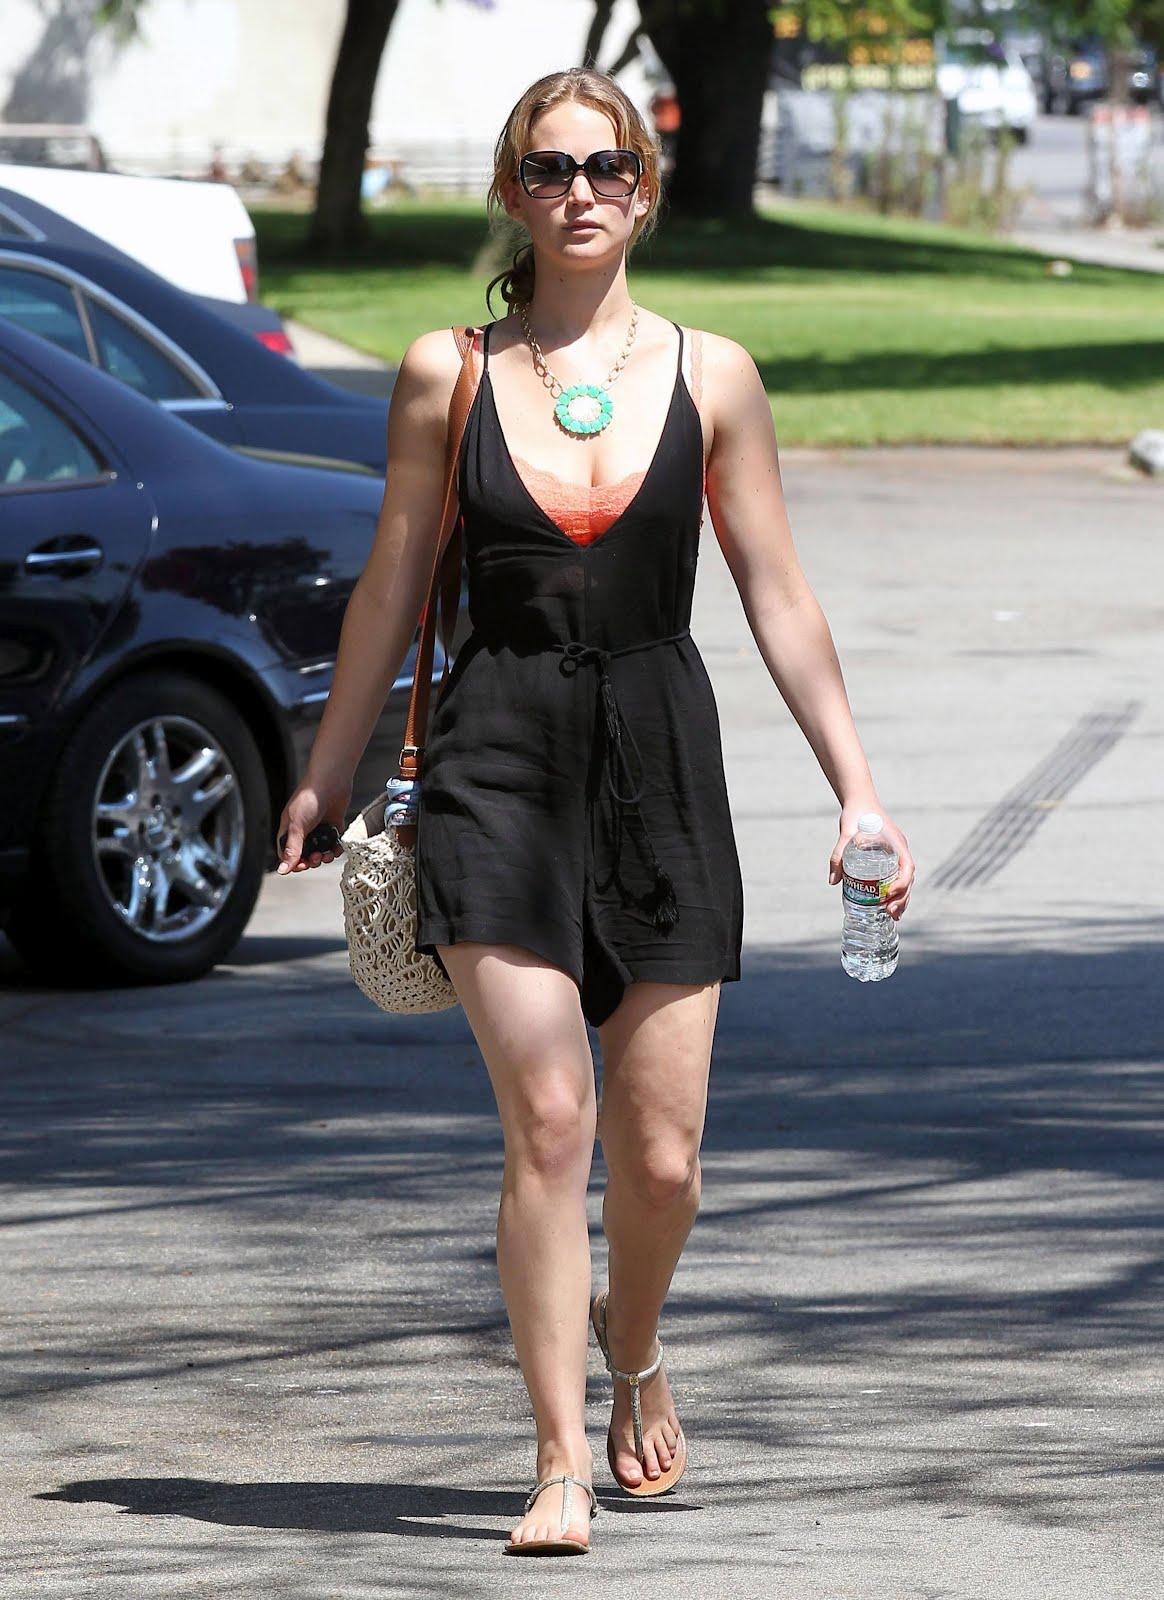 http://3.bp.blogspot.com/-MNOwDePBOfU/UCfq4EAlYkI/AAAAAAAAChA/zRHjckKDrqc/s1600/Jennifer%2BLawrence%2BHollywood7.jpg